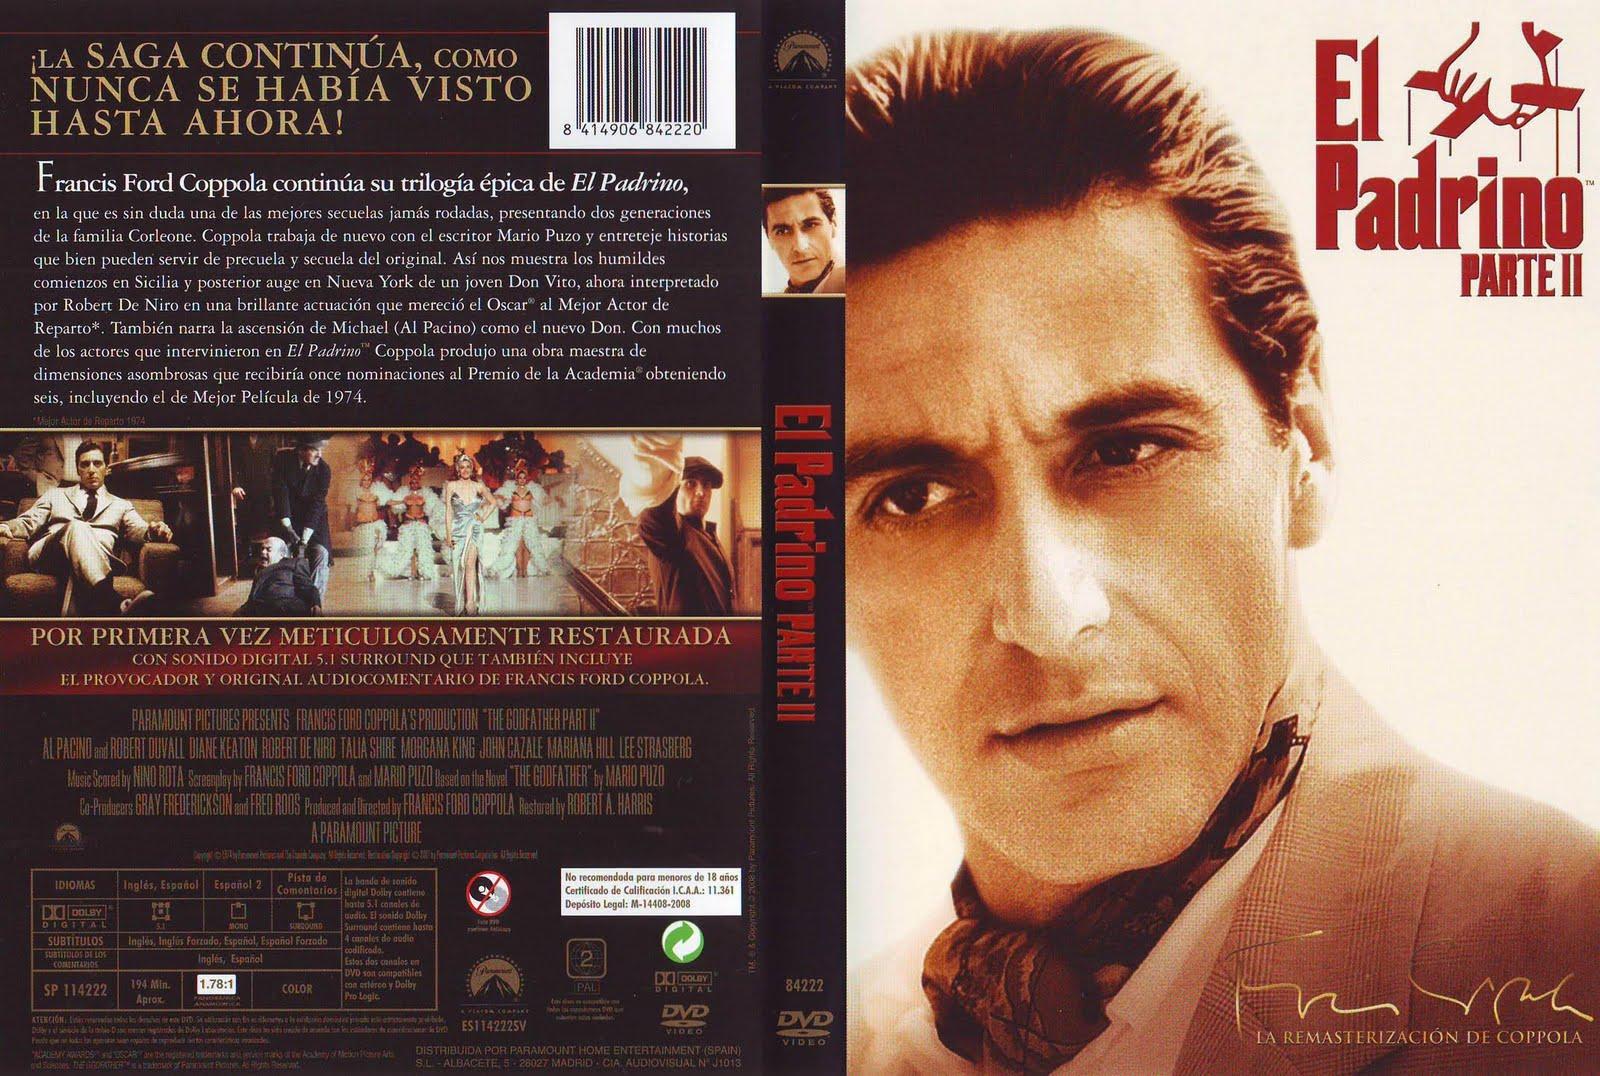 The godfather original movie poster